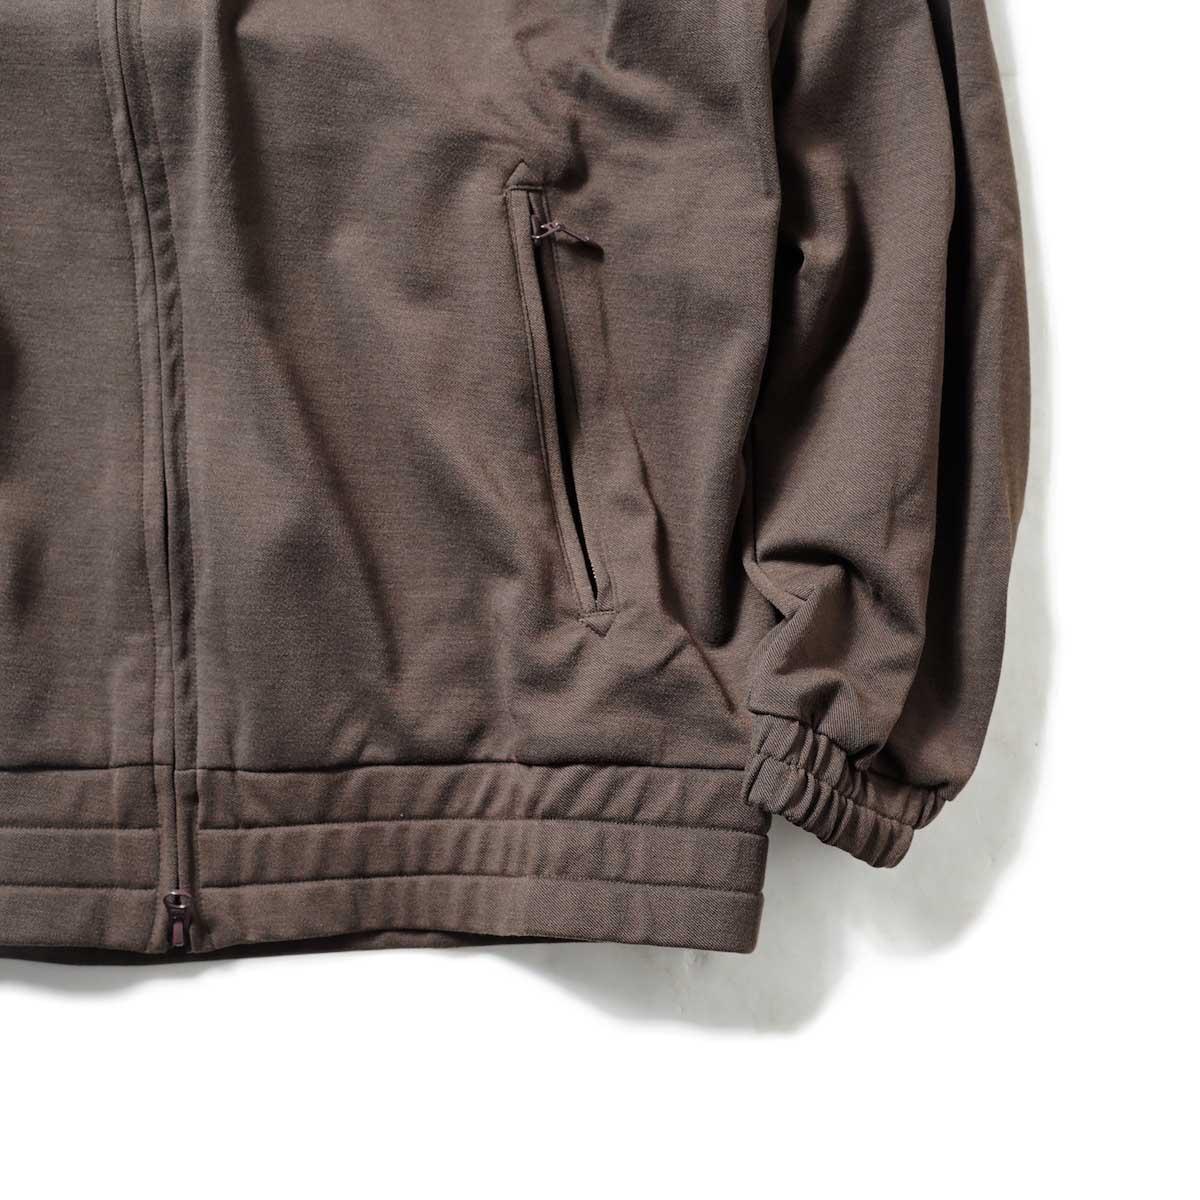 Needles / W.U. JACKET - POLY TWILL JERSEY (Brown)袖、裾